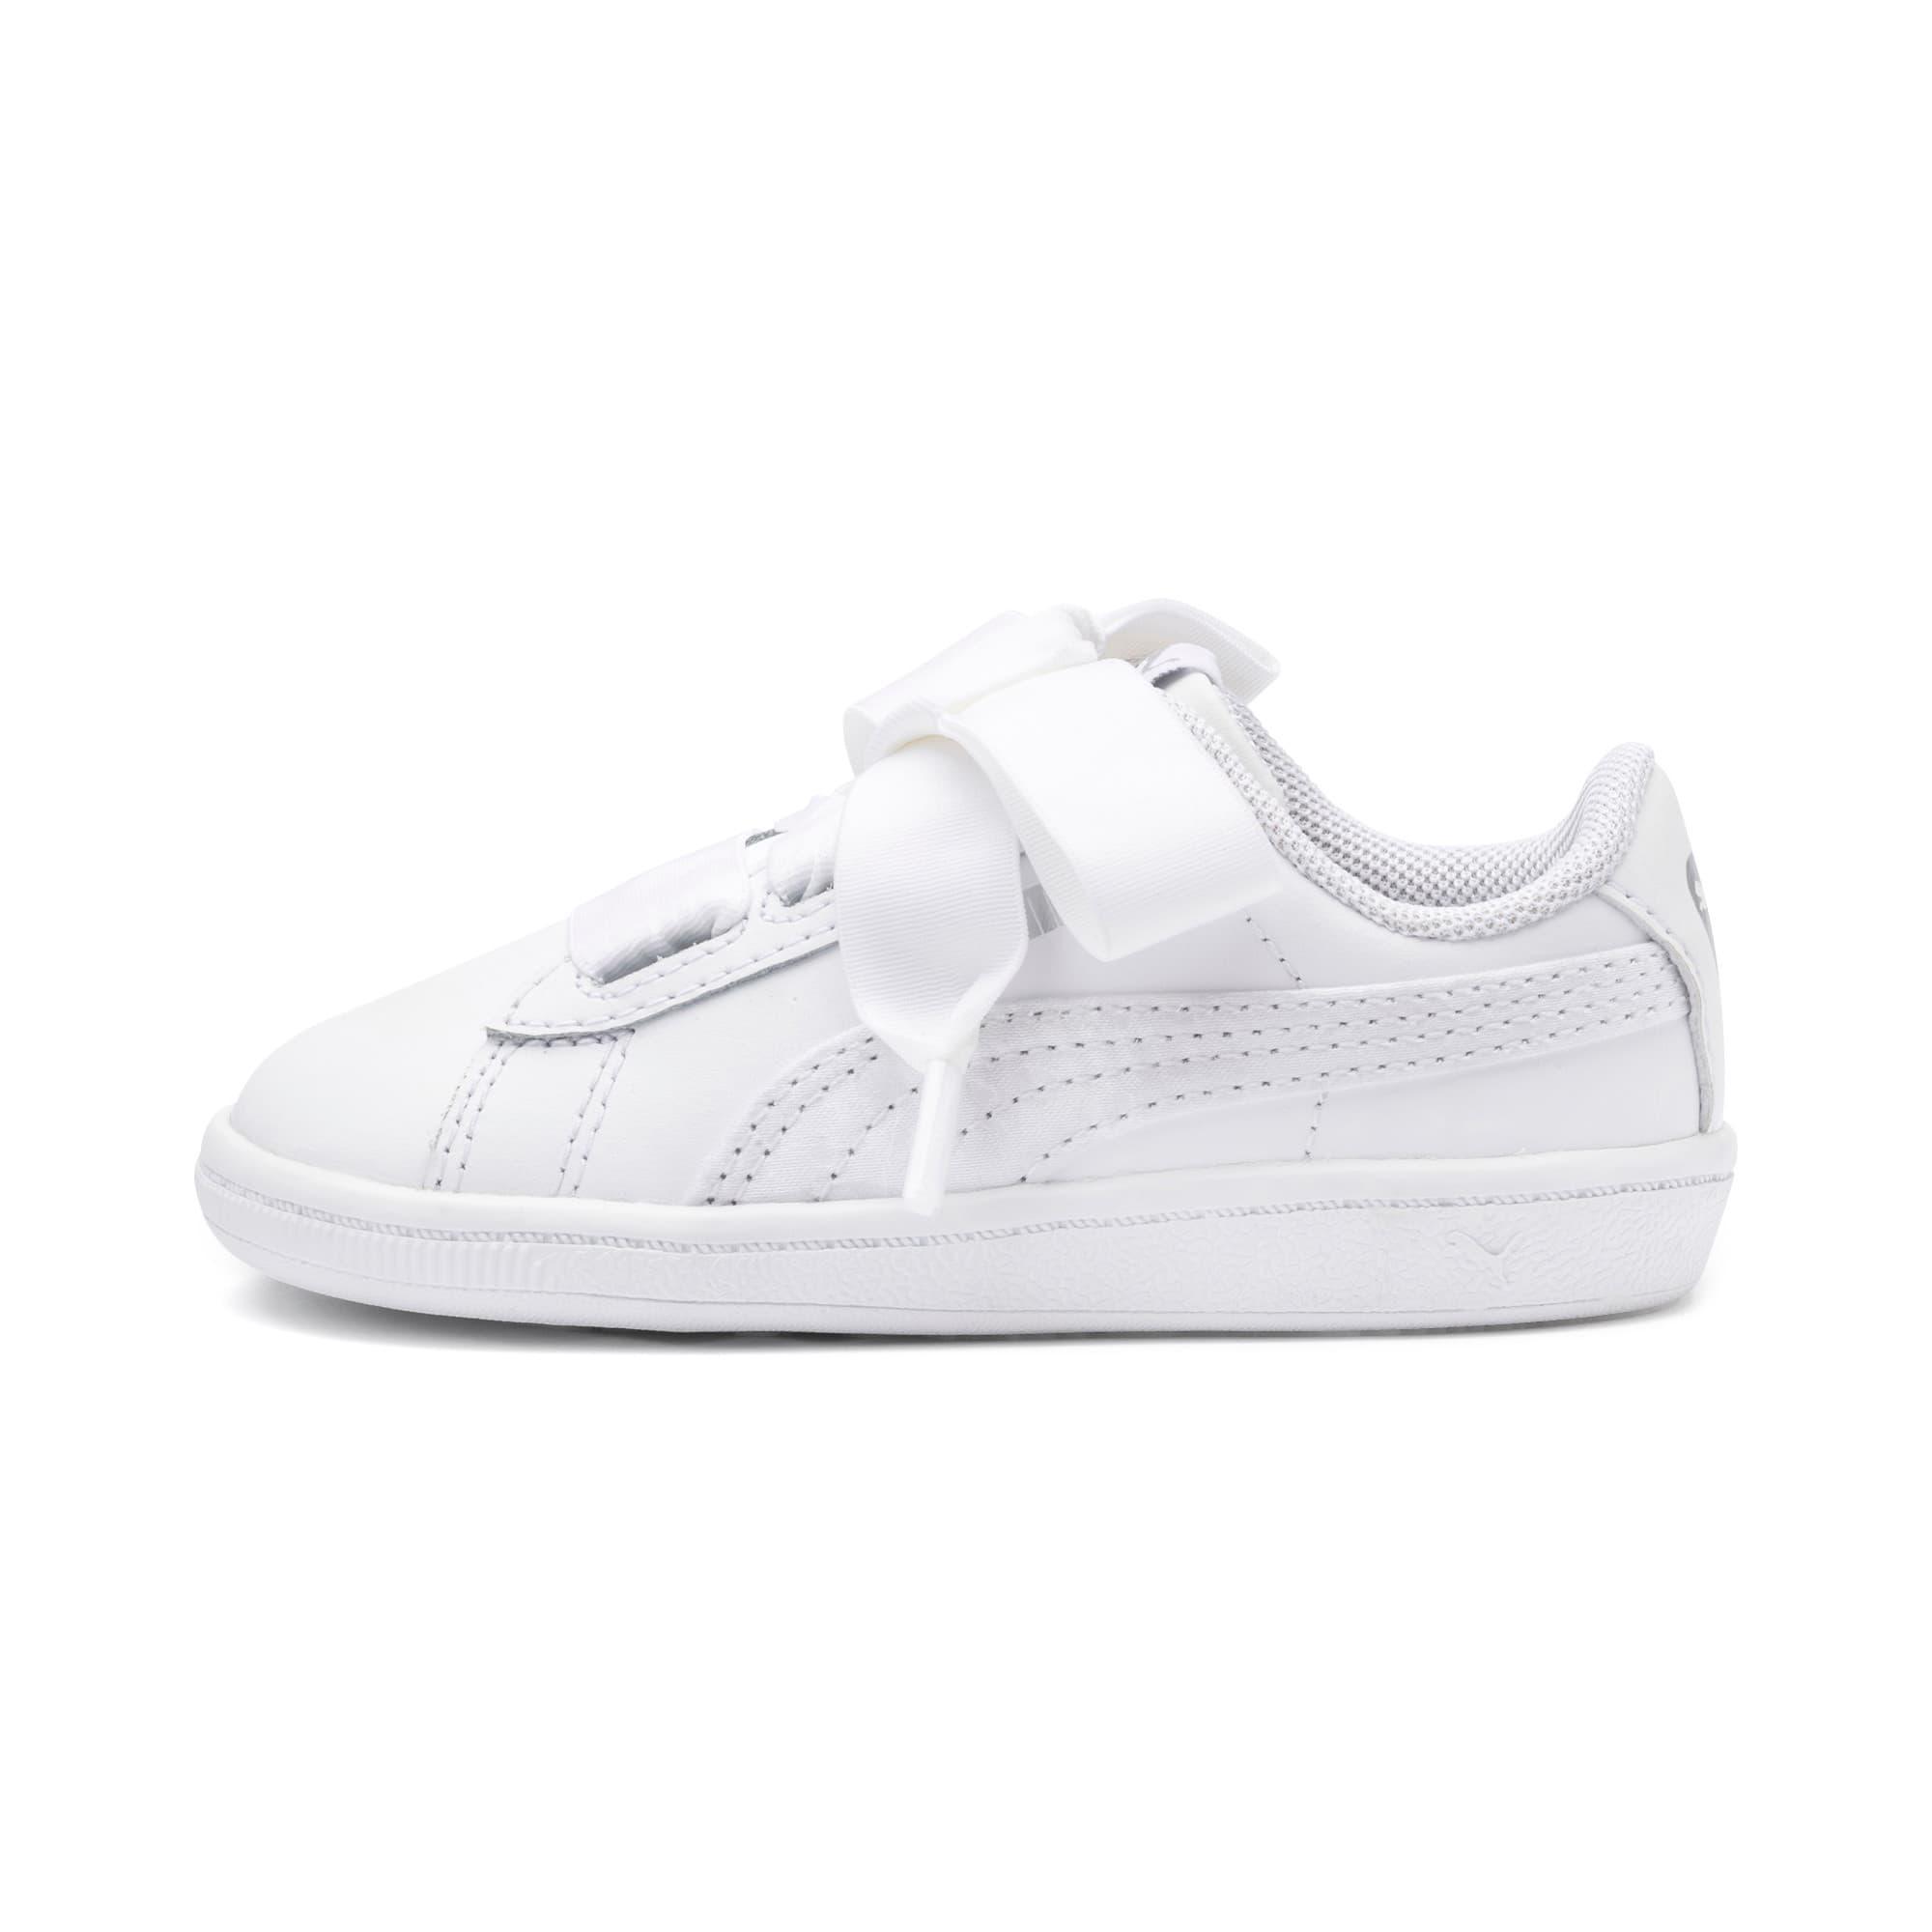 Miniatura 1 de ZapatosPUMA Vikky Ribbon Satin AC para niños, Puma White-Puma White, mediano